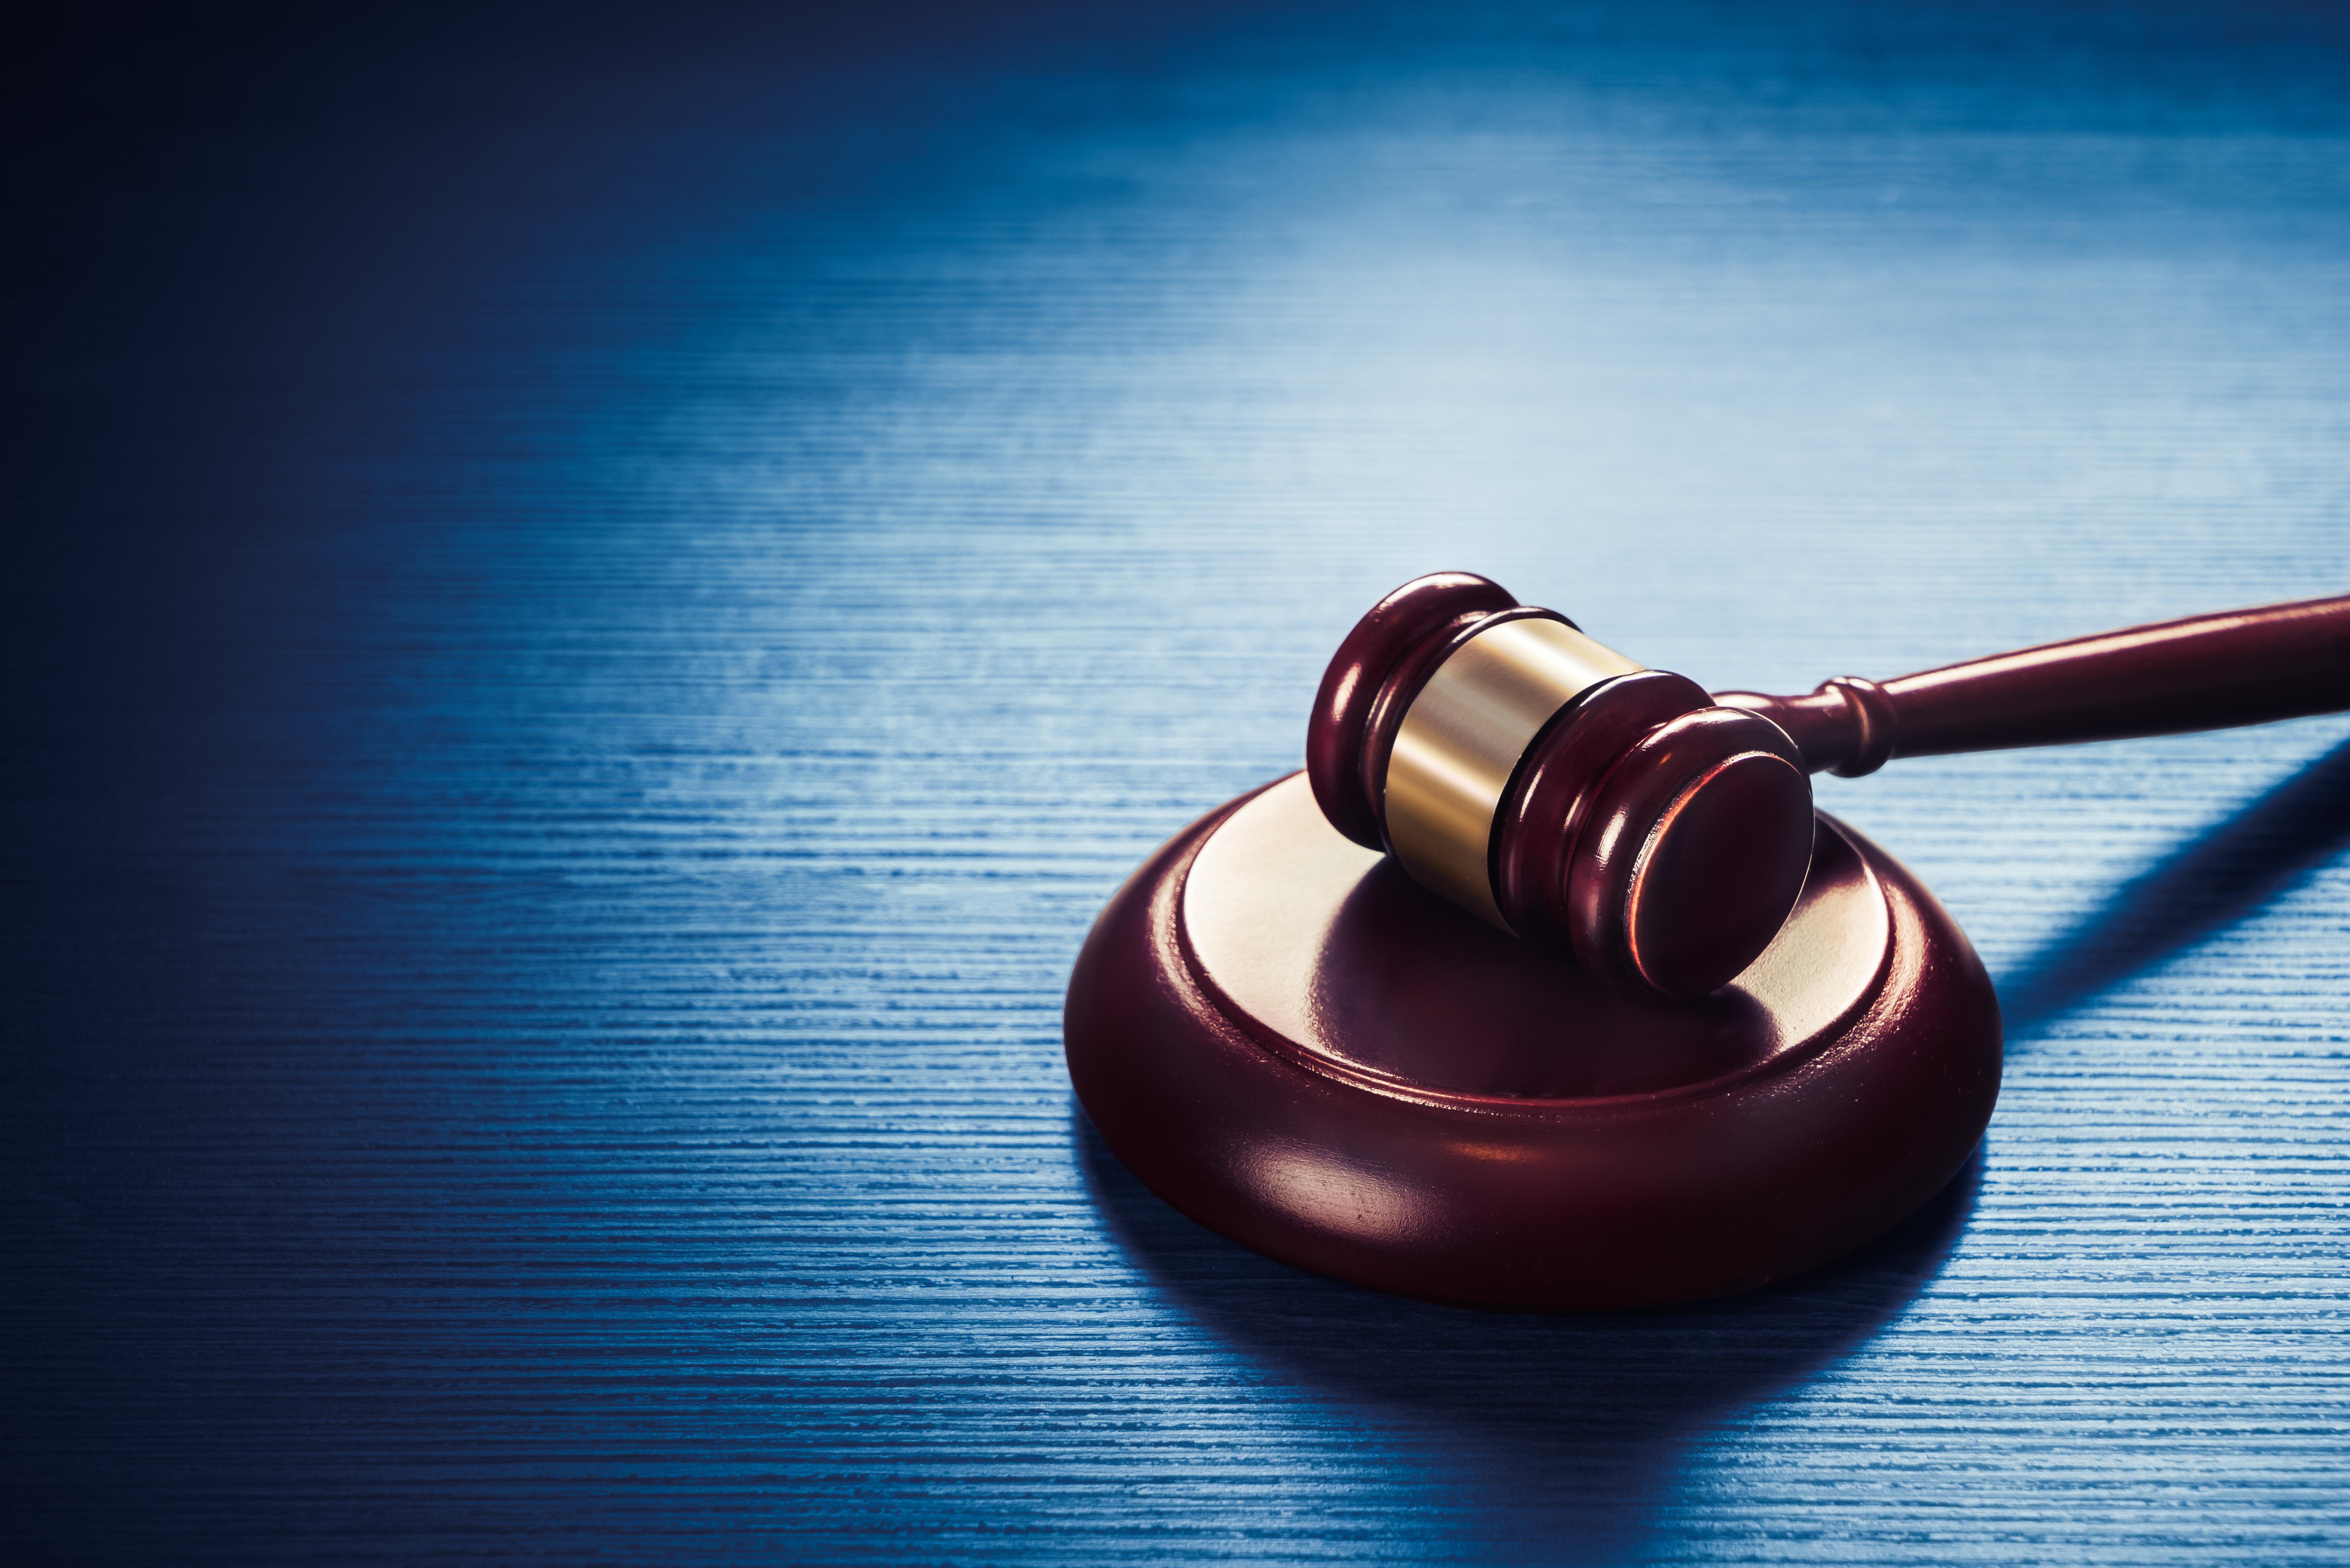 Dominic Sanders was found guilty of murder Jan. 24, 2020.